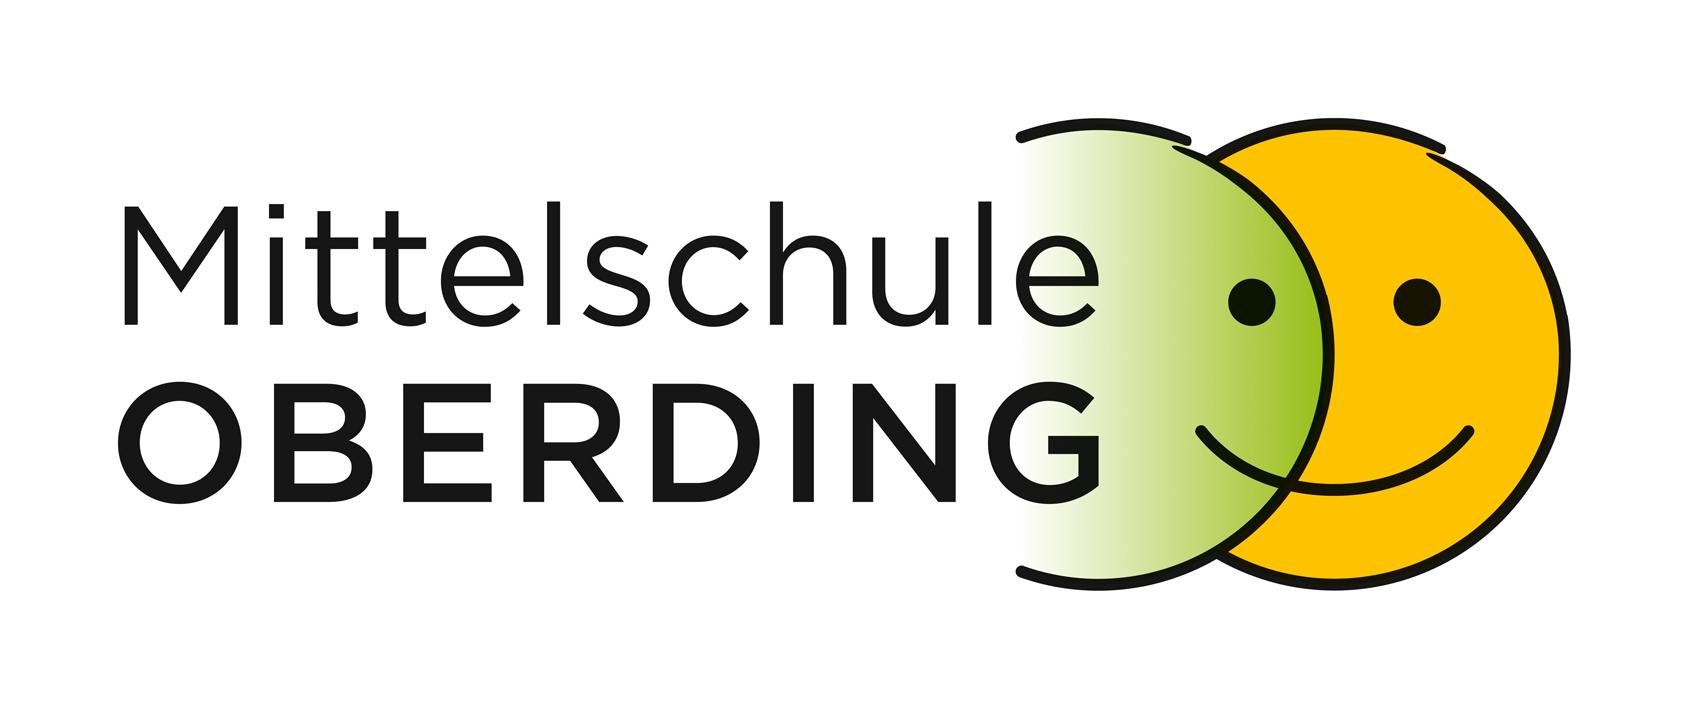 MS Oberding Logo RGB 300dpi